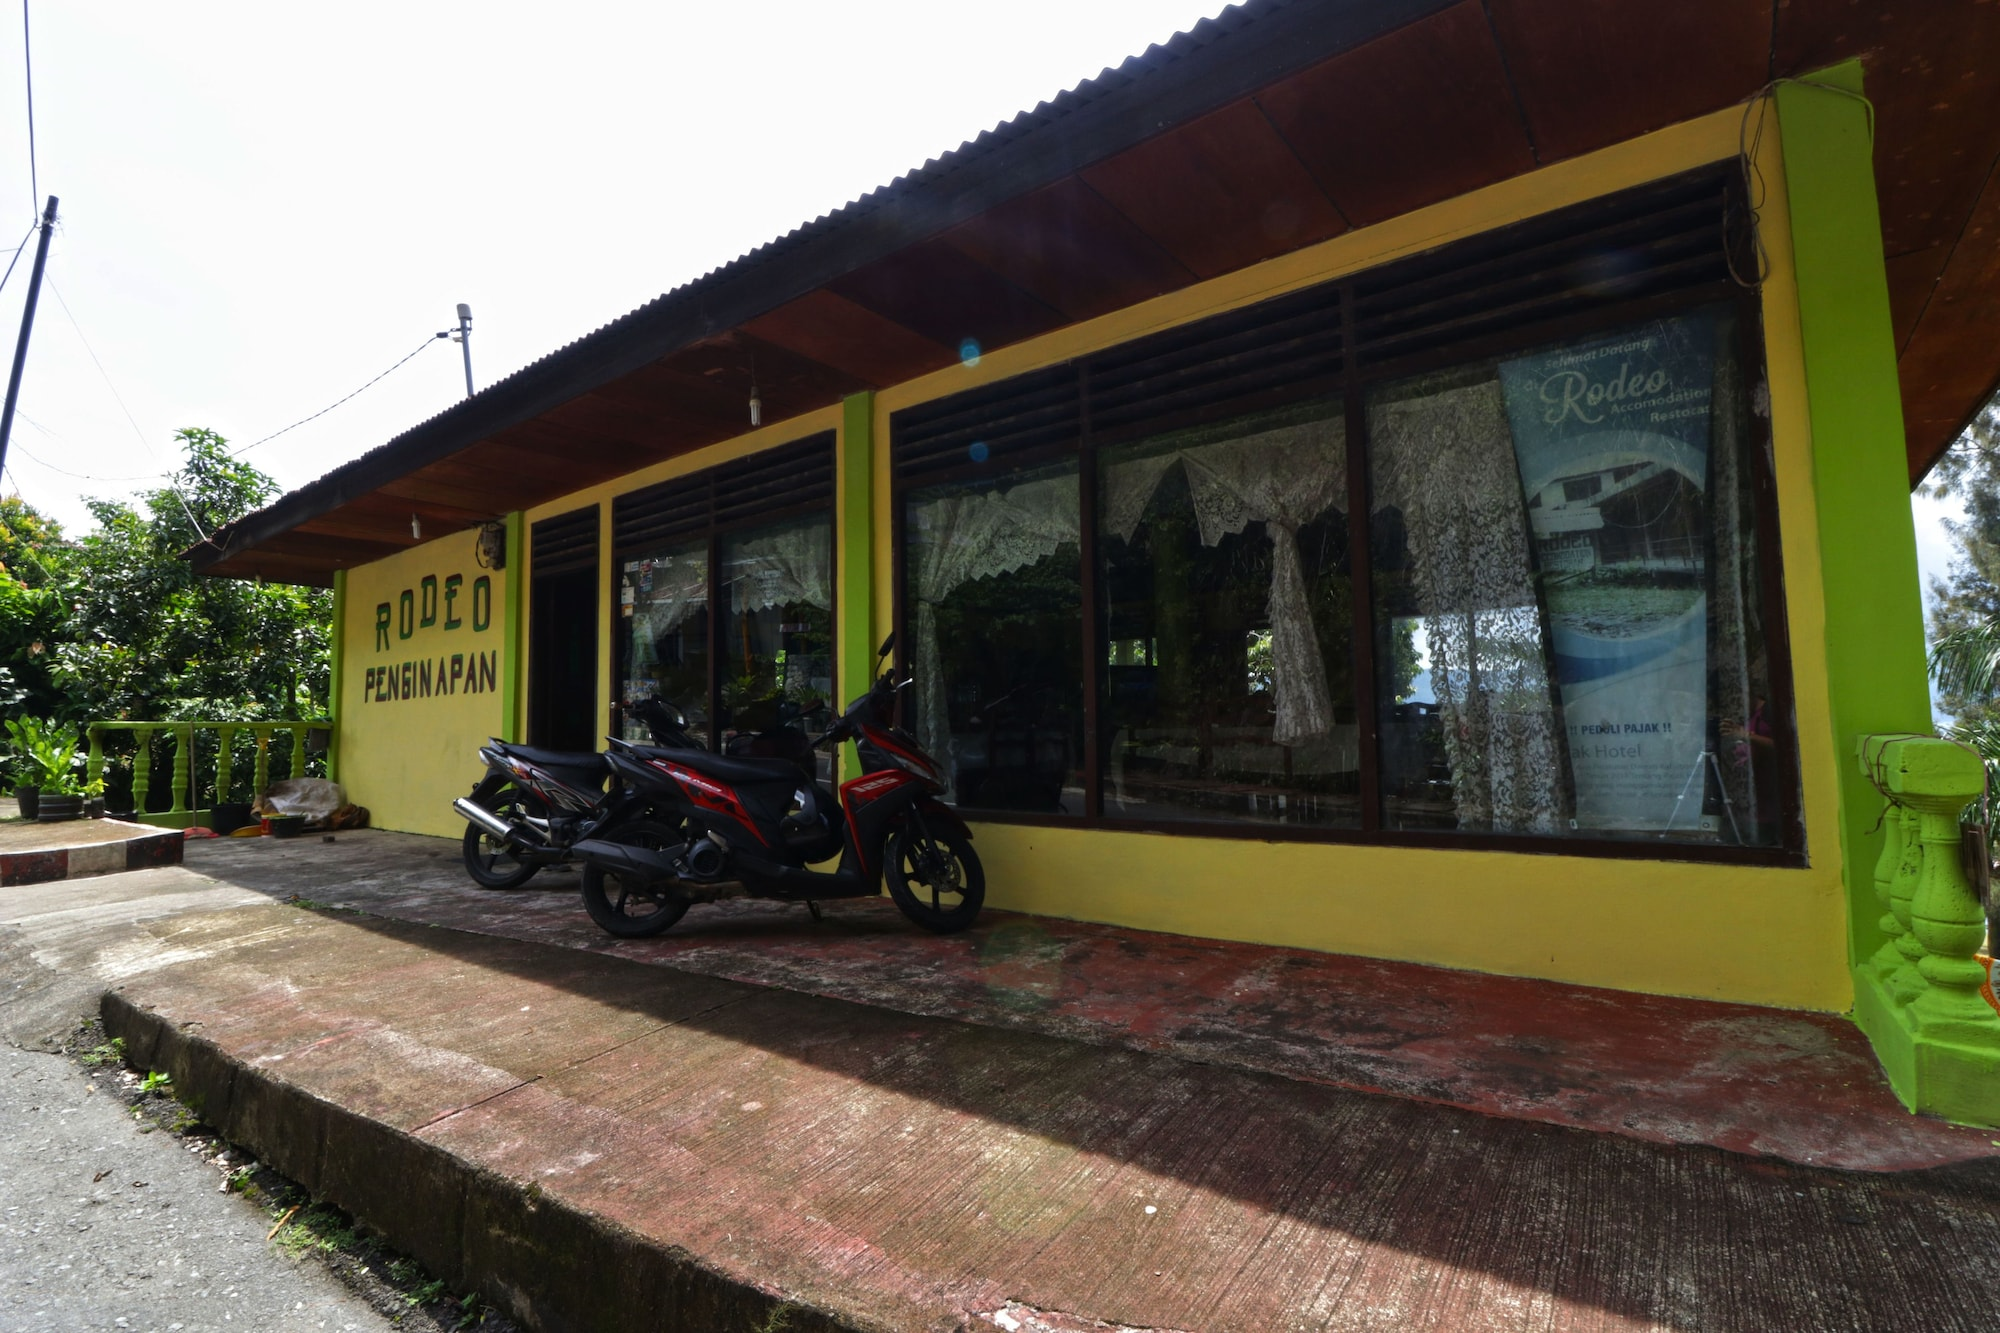 Penginapan Rodeo, Samosir